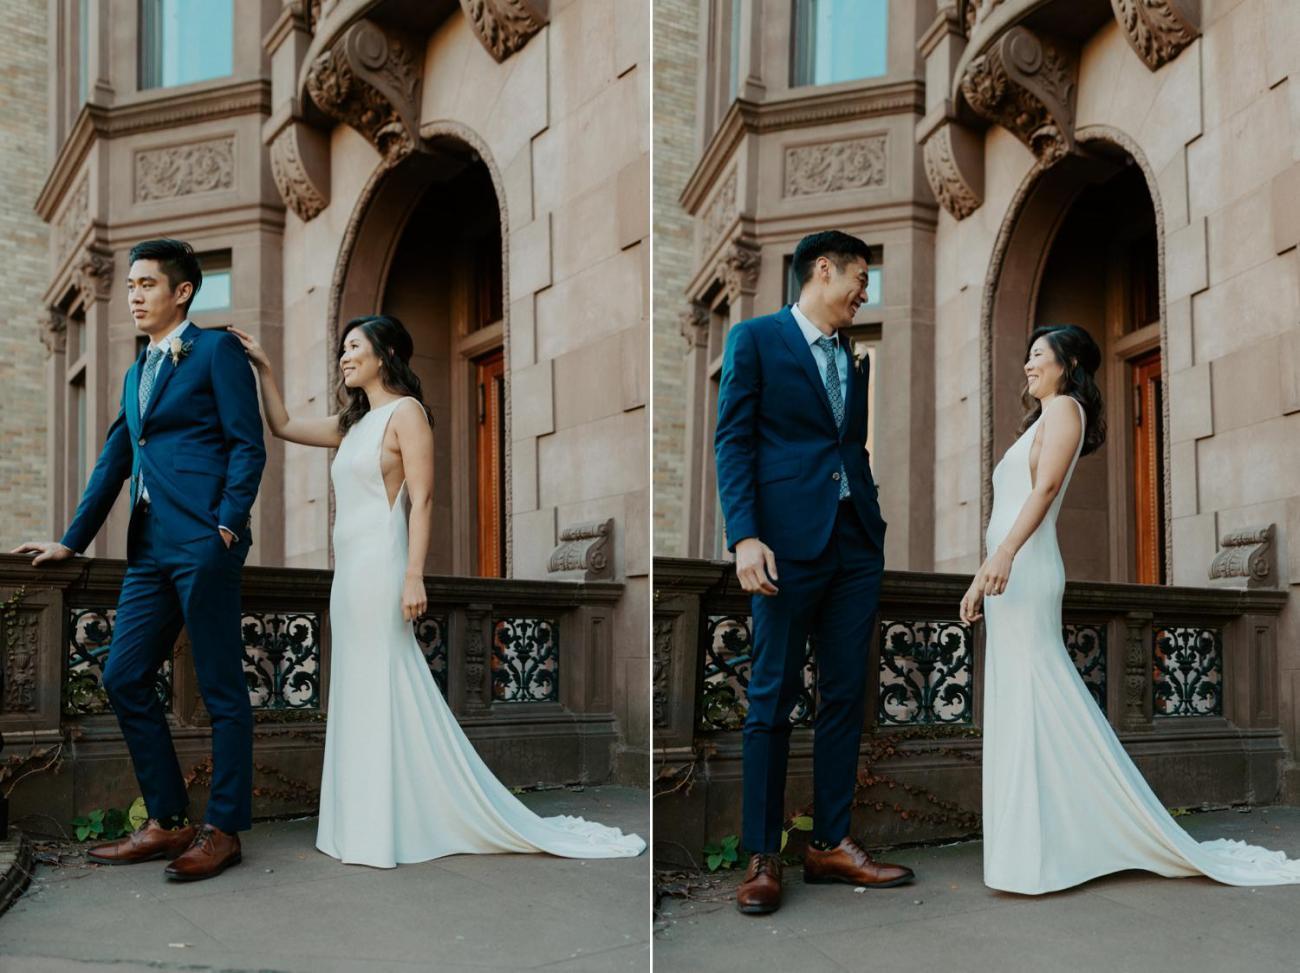 Brooklyn Brownstone House Backyard Wedding New York Wedding Photographer Anais Possamai Photography 13